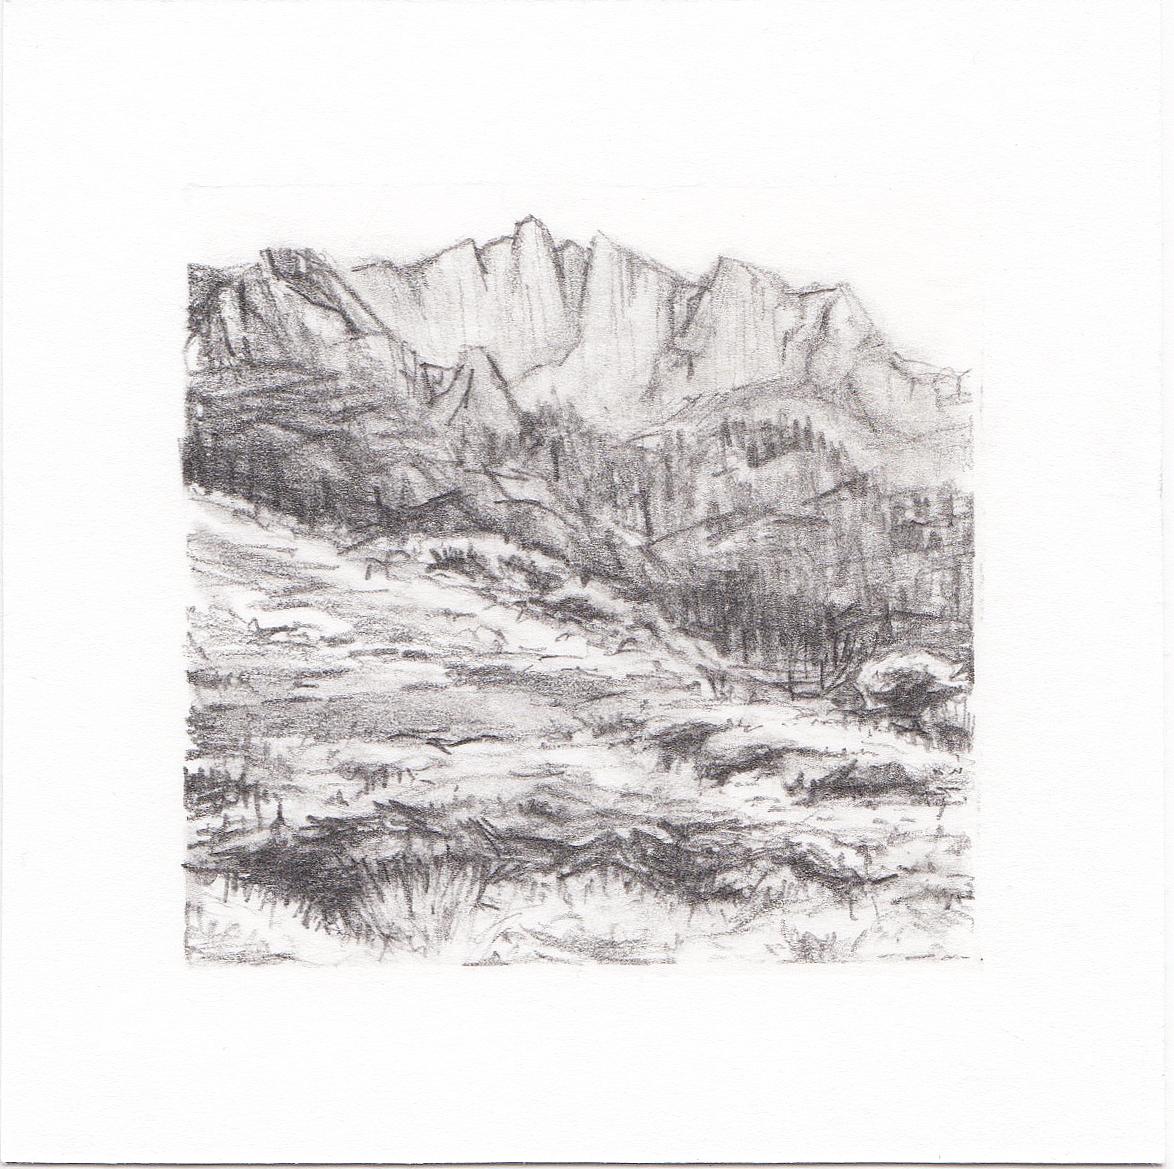 #59 Lone Peak, Wasatch Mountains, Utah | 3x3 | graphite